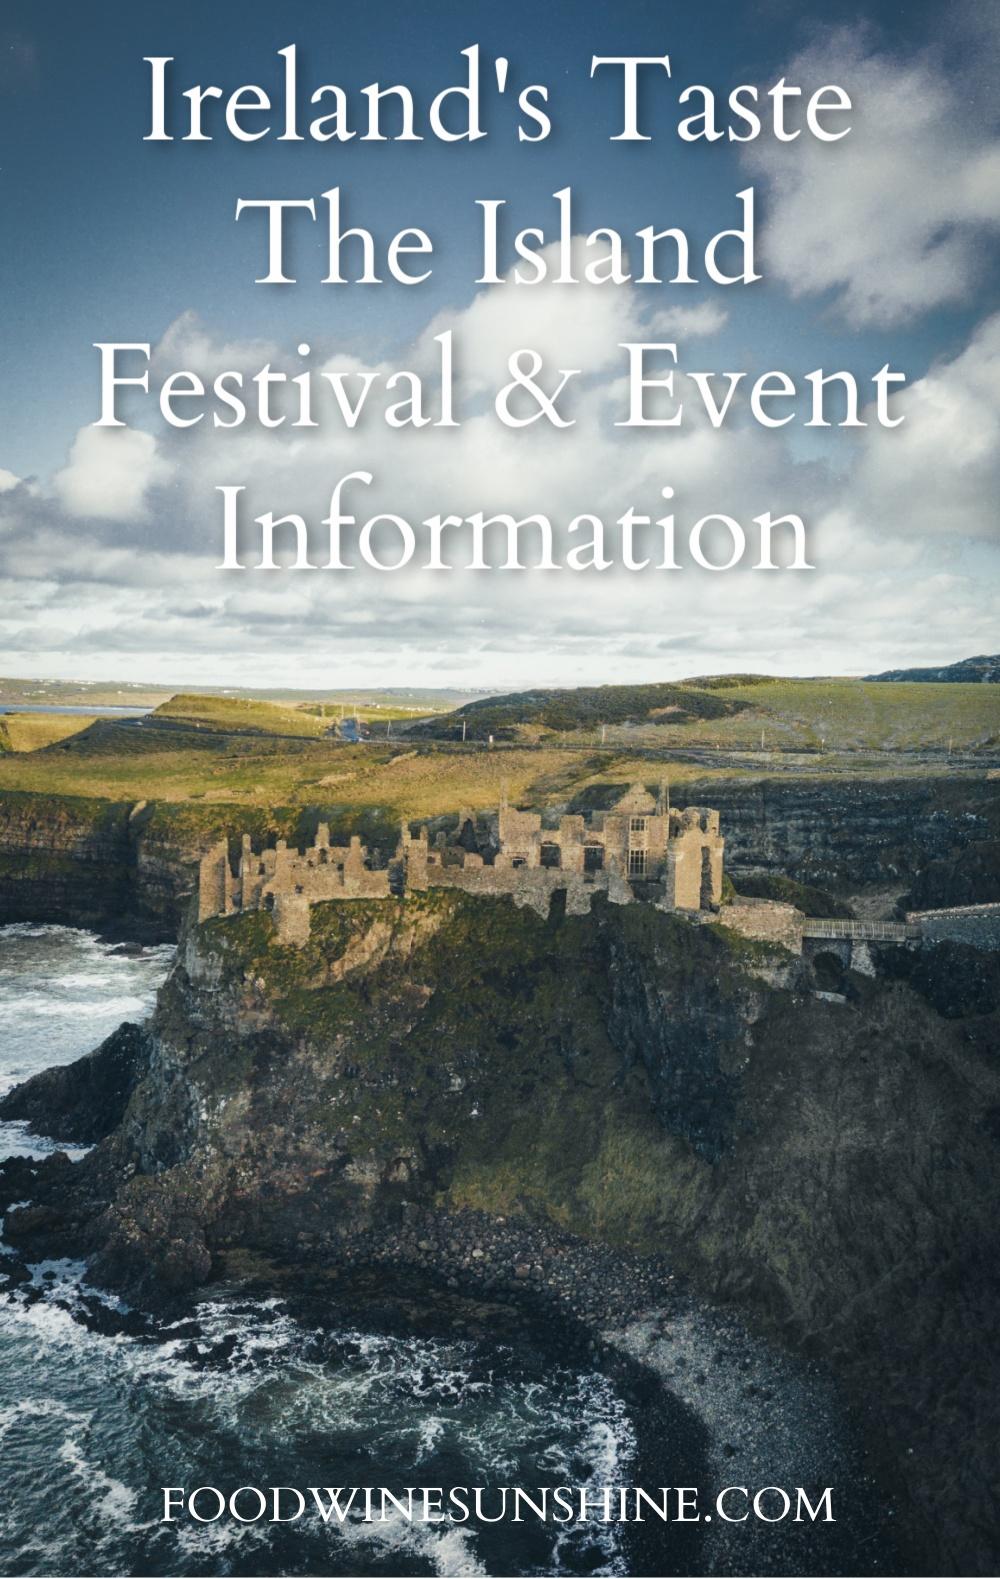 Taste The Island Festival & Event Information